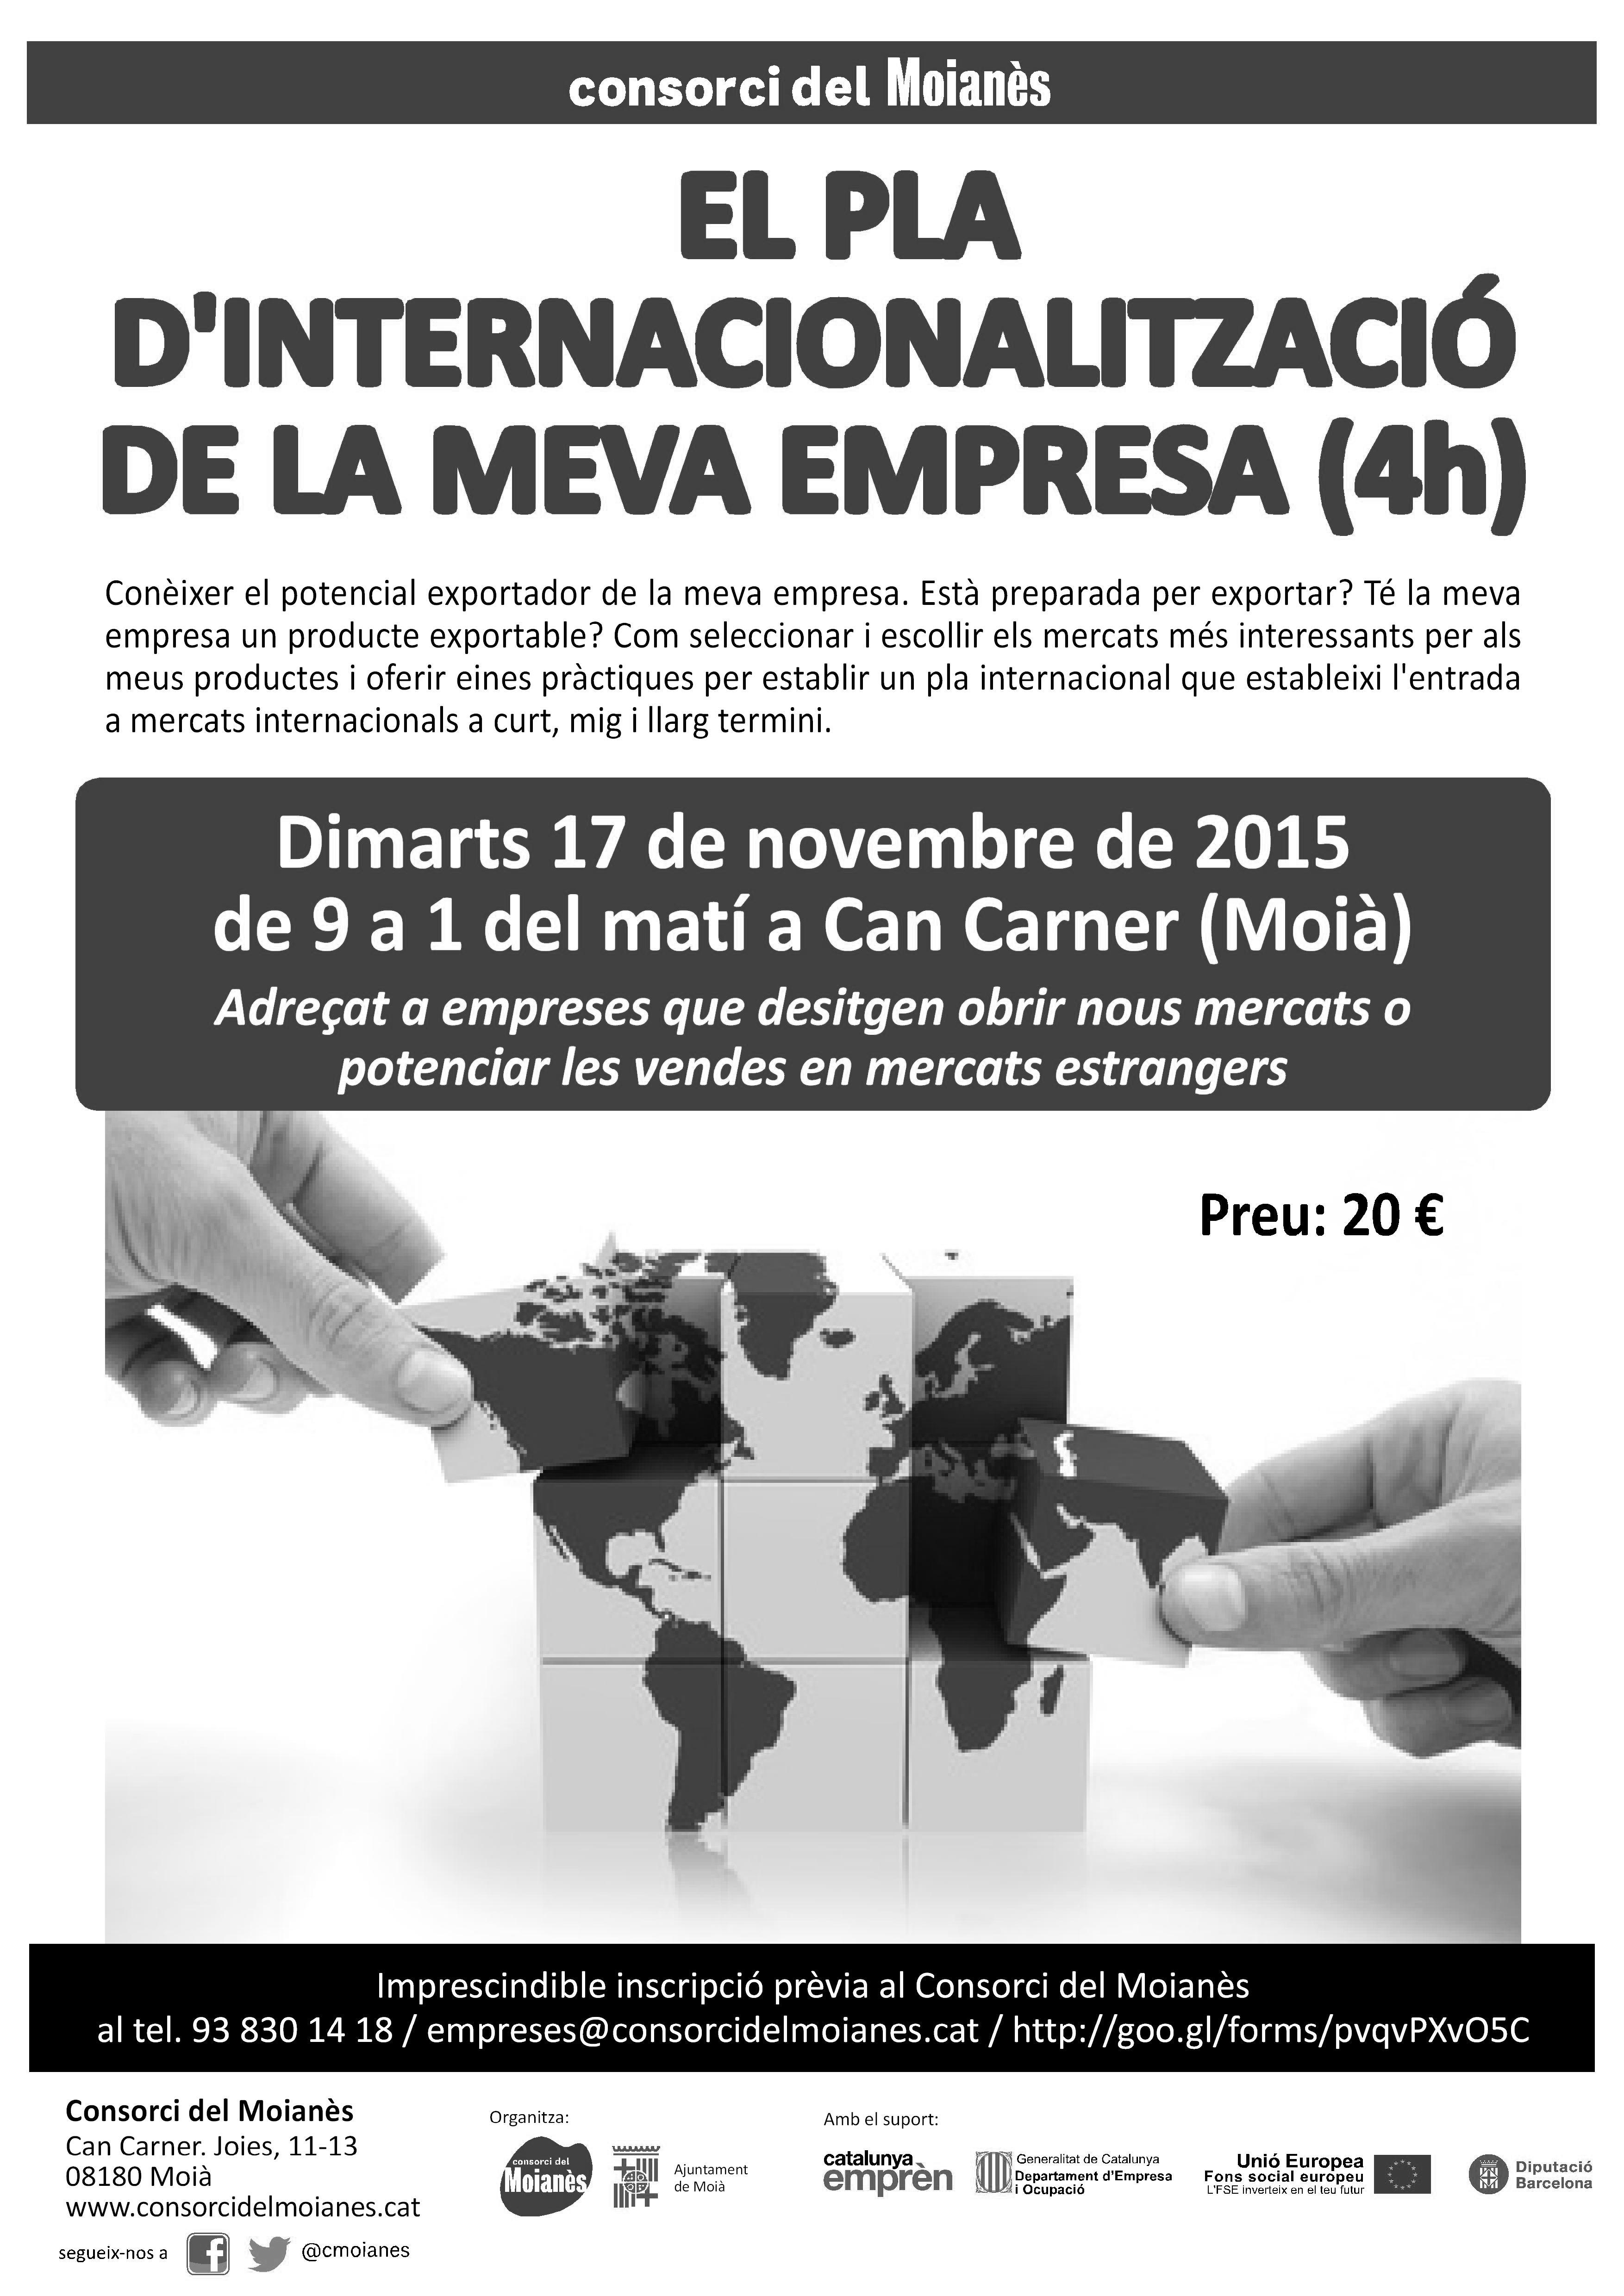 Seminari internacionalitzacio ITC Consorci Moianes bin